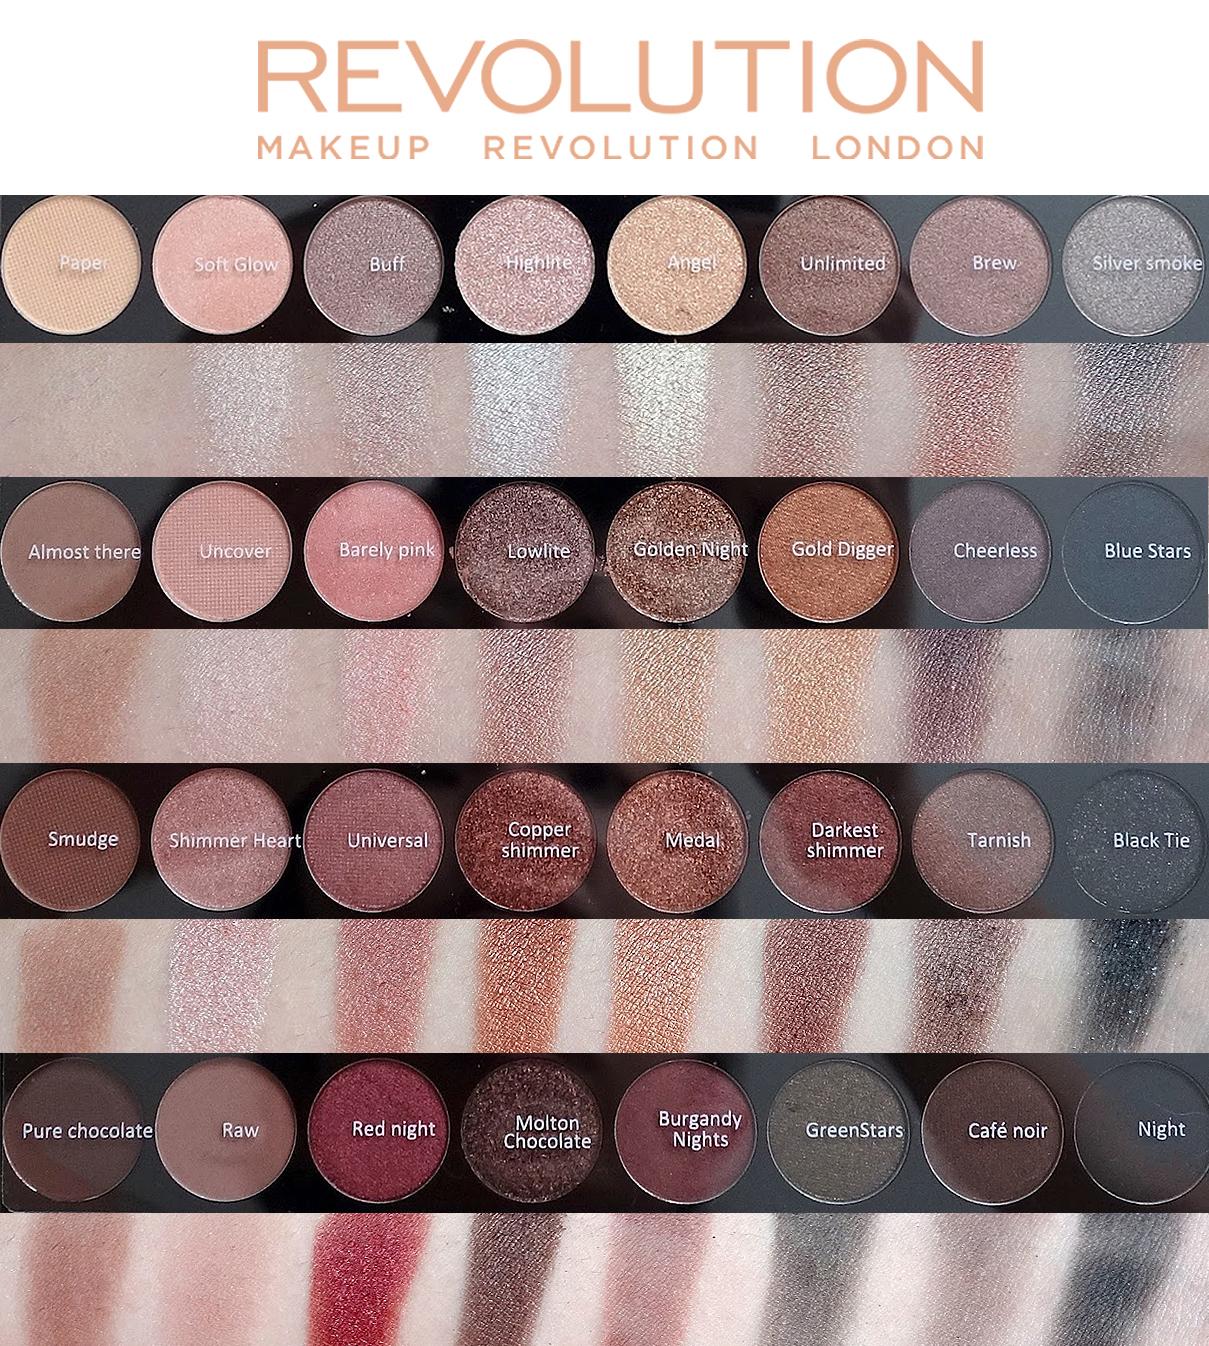 Makeup revolution london flawless matte 2